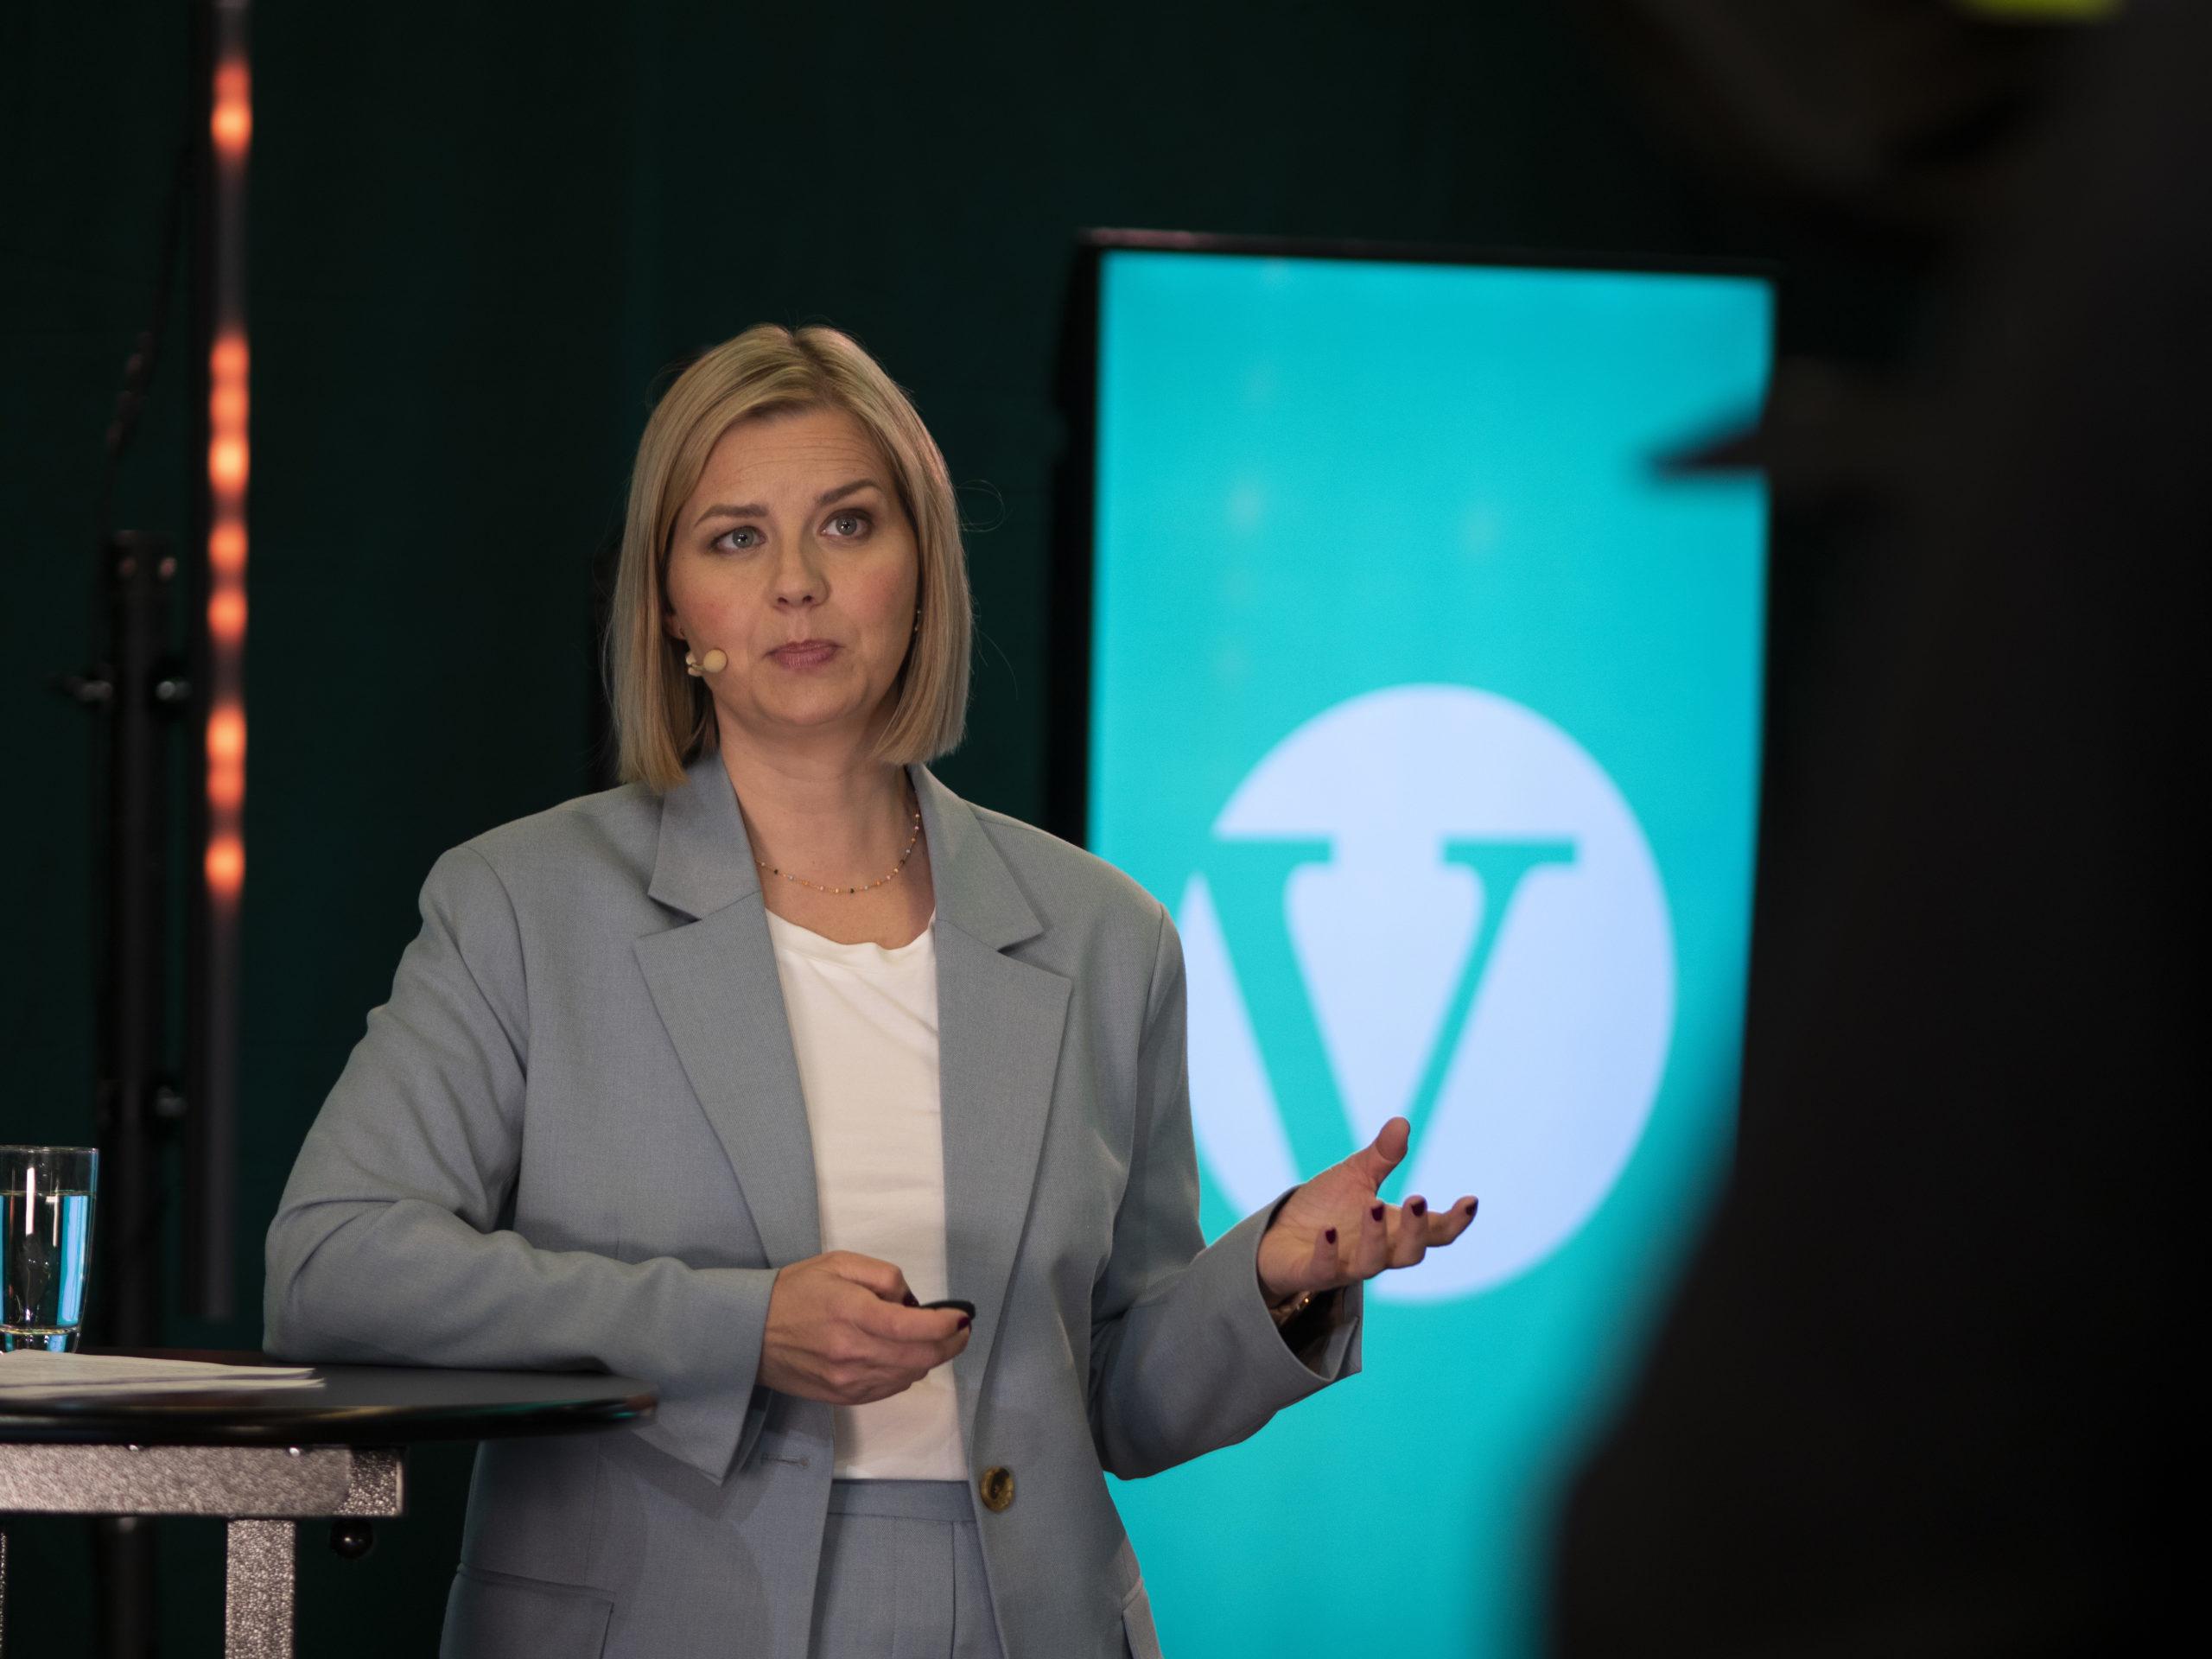 Store  nynorskforventningar  til  Venstre